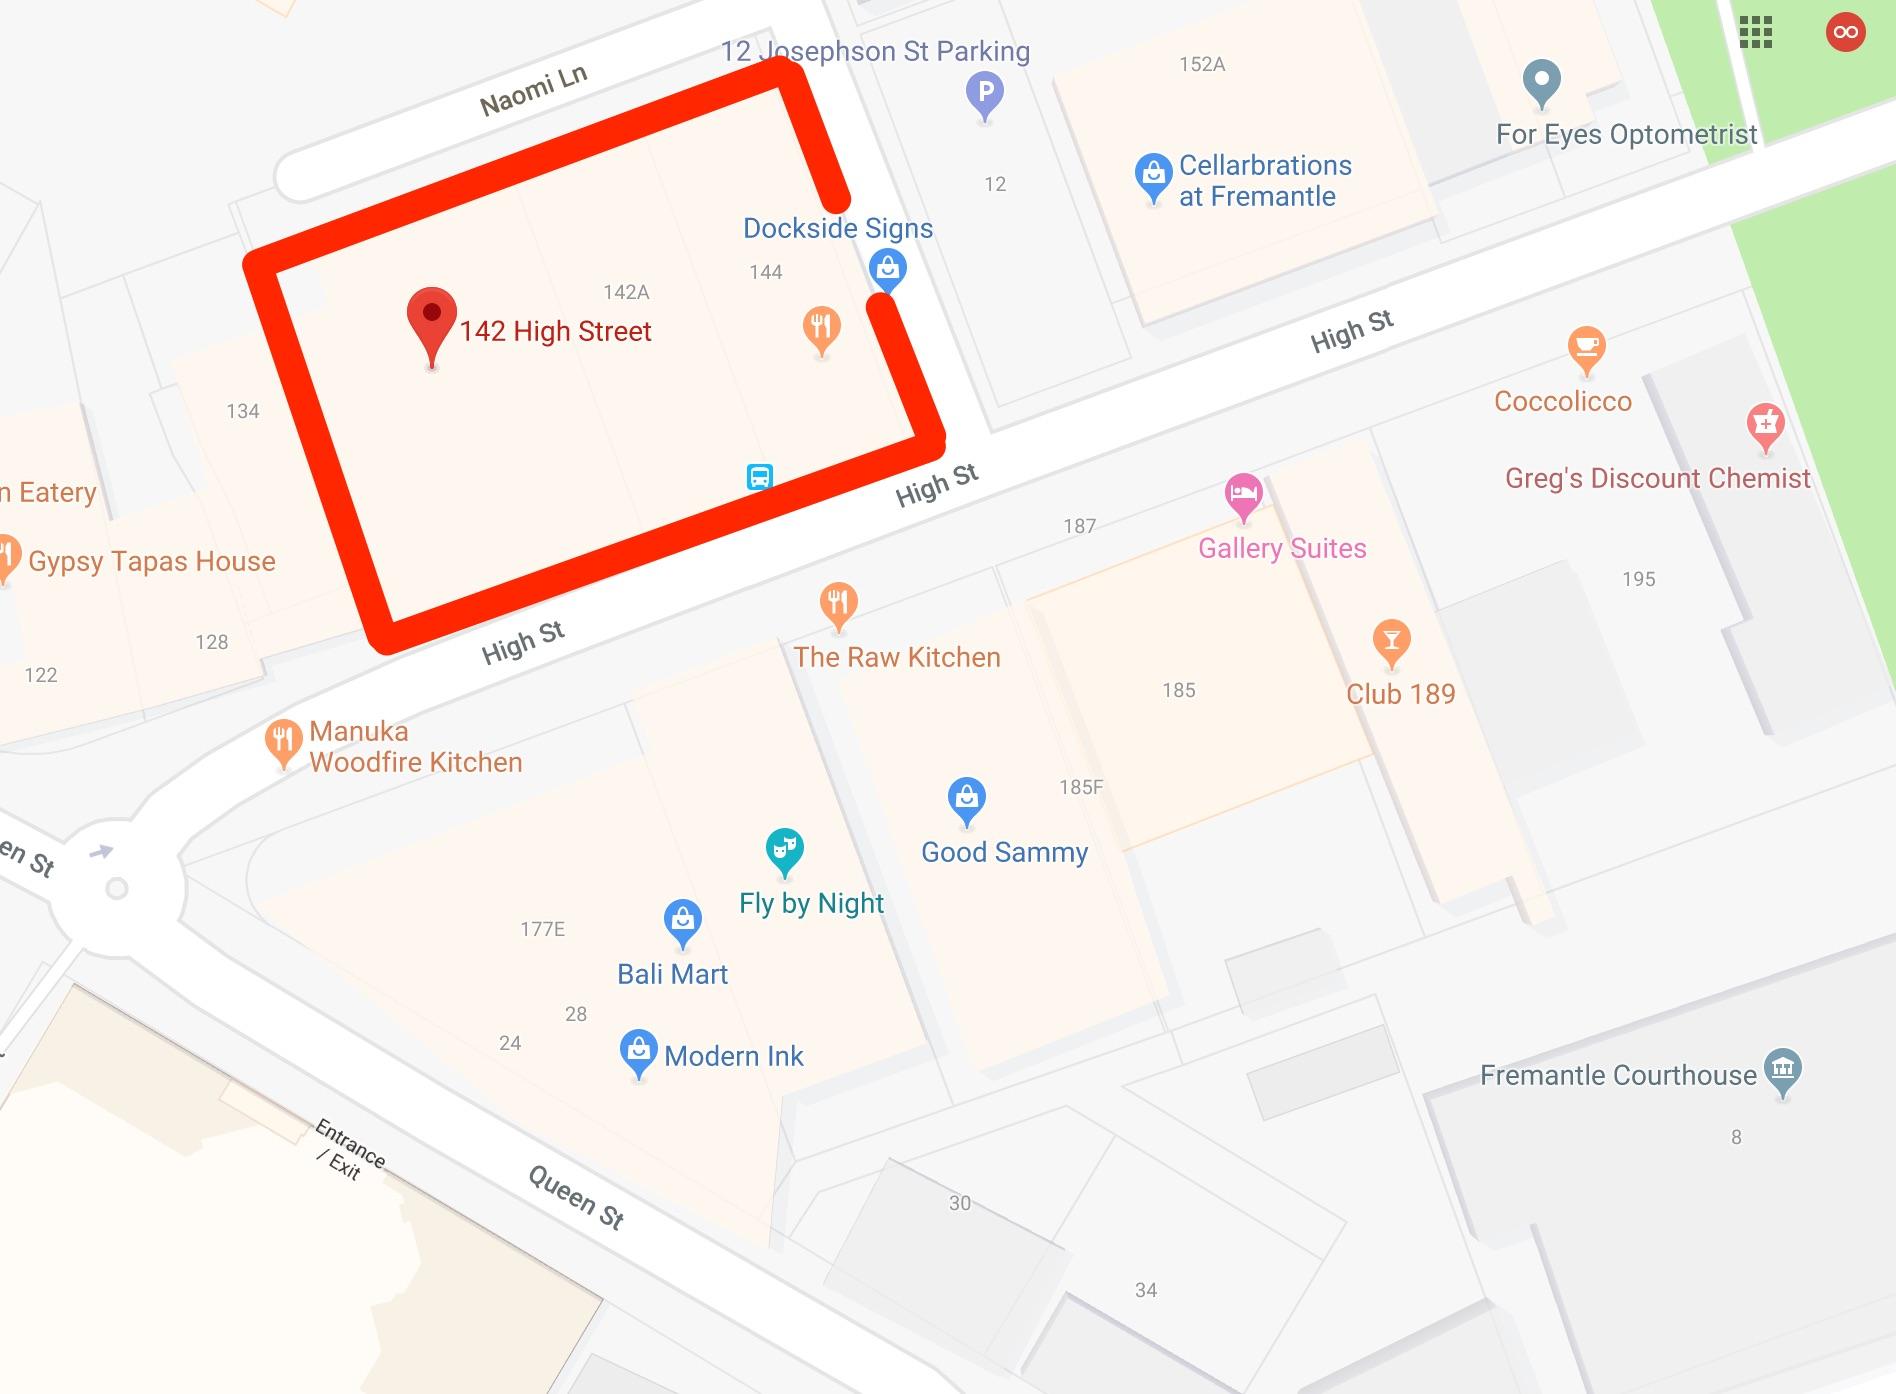 Google Maps - 142 High Street, Fremantle, Australia